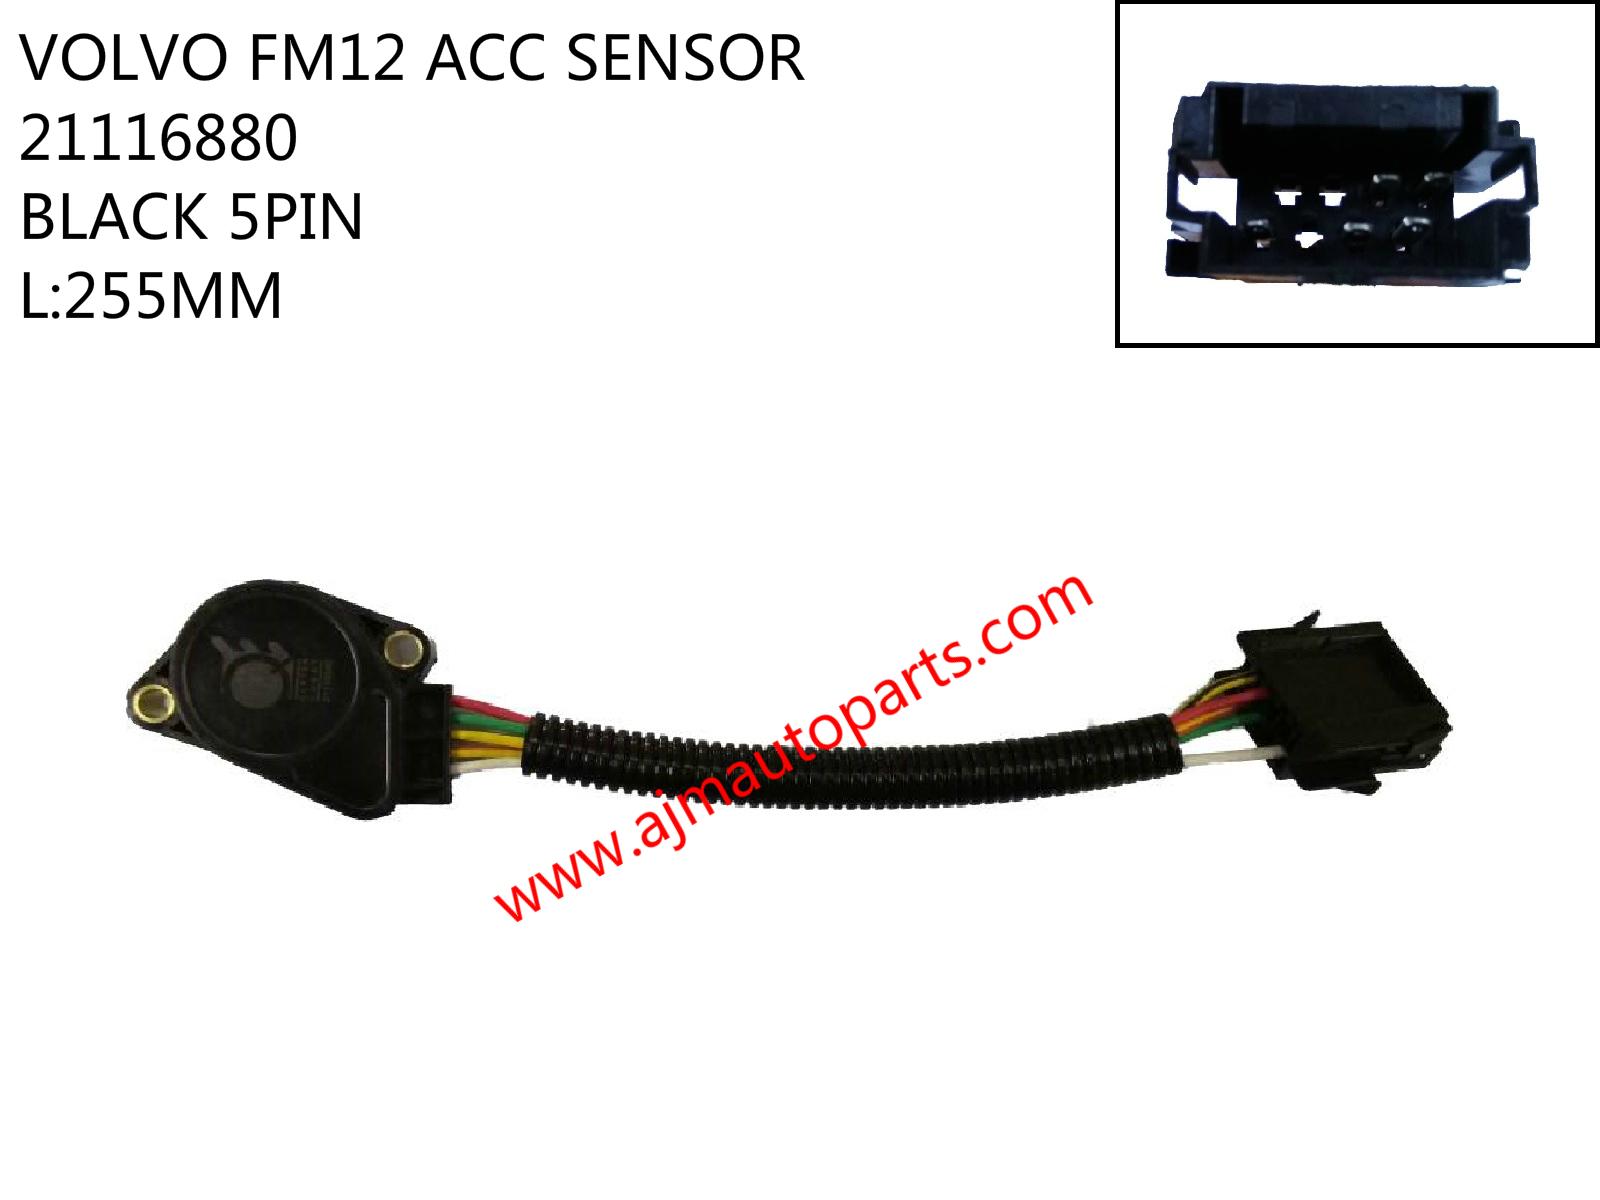 VOLVO FM12 ACC SENSOR-BLACK-5PIN-21116880_